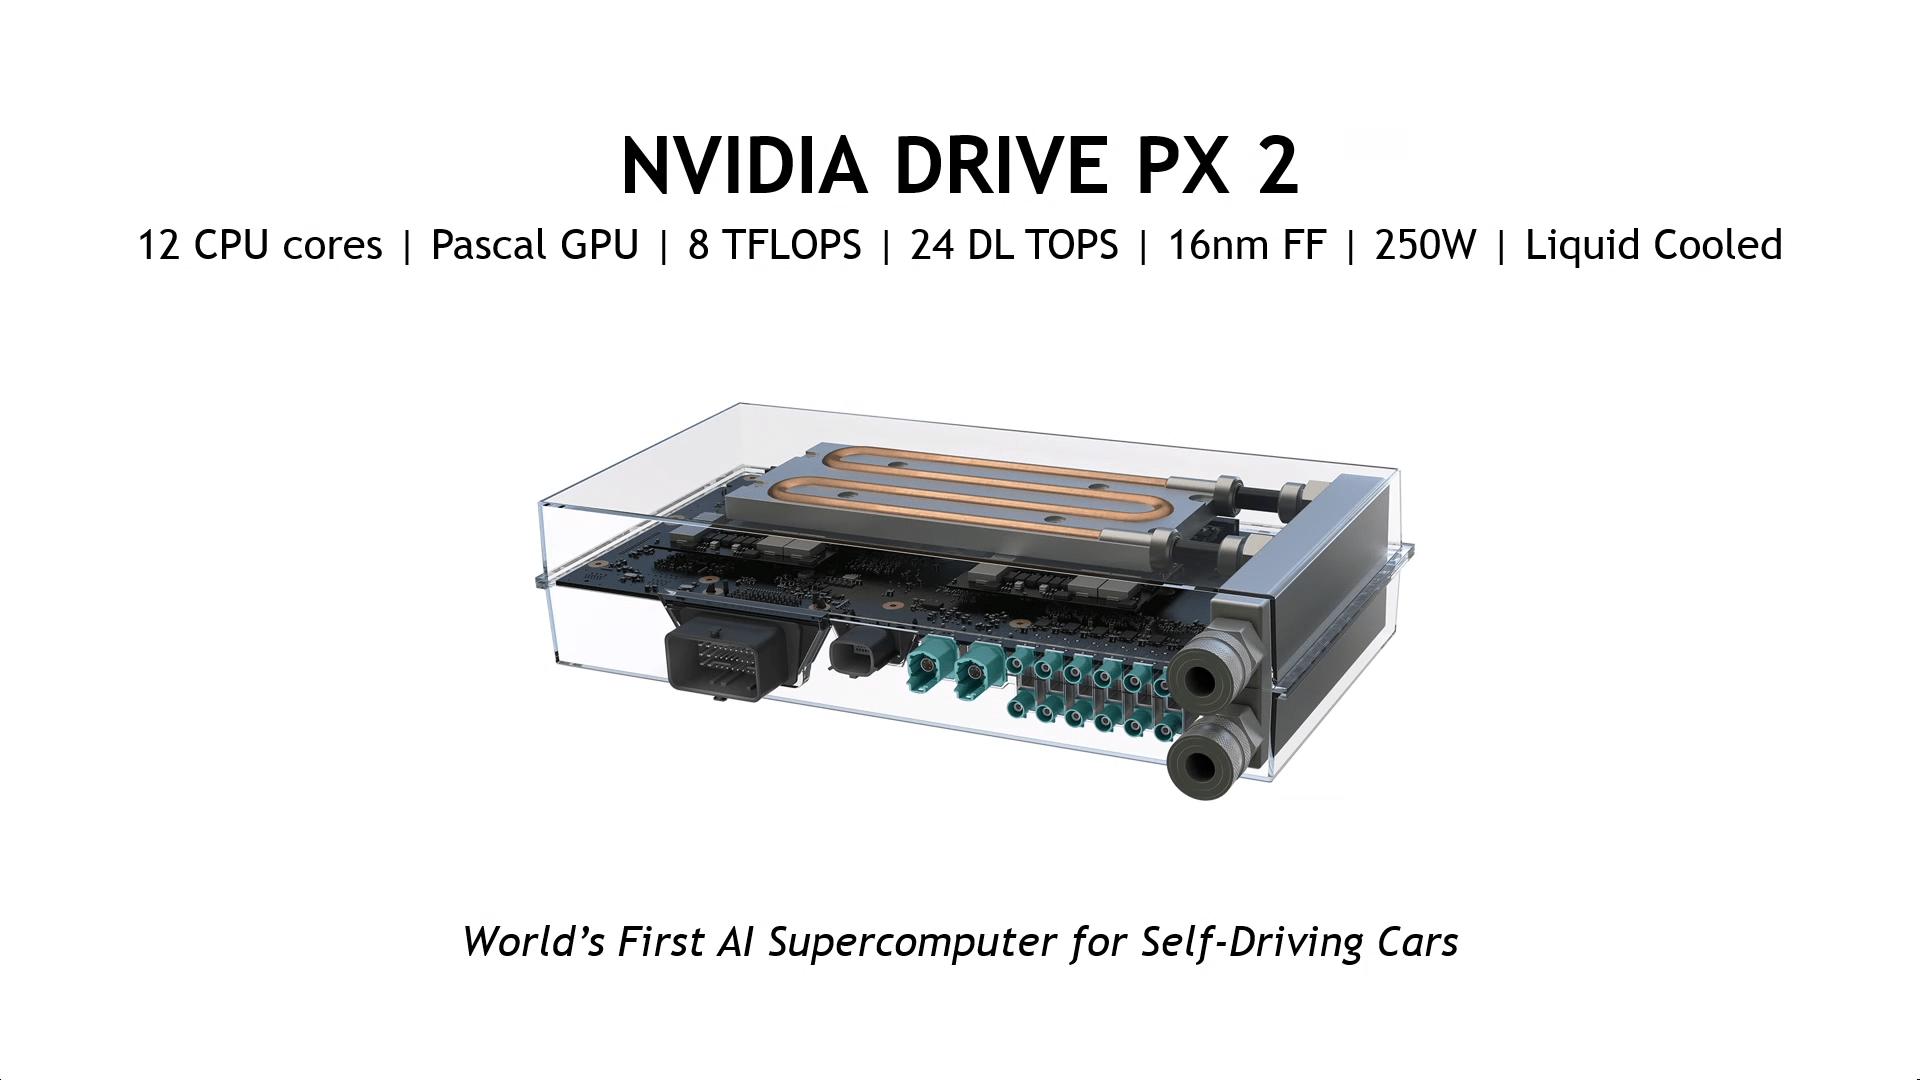 Drive PX 2